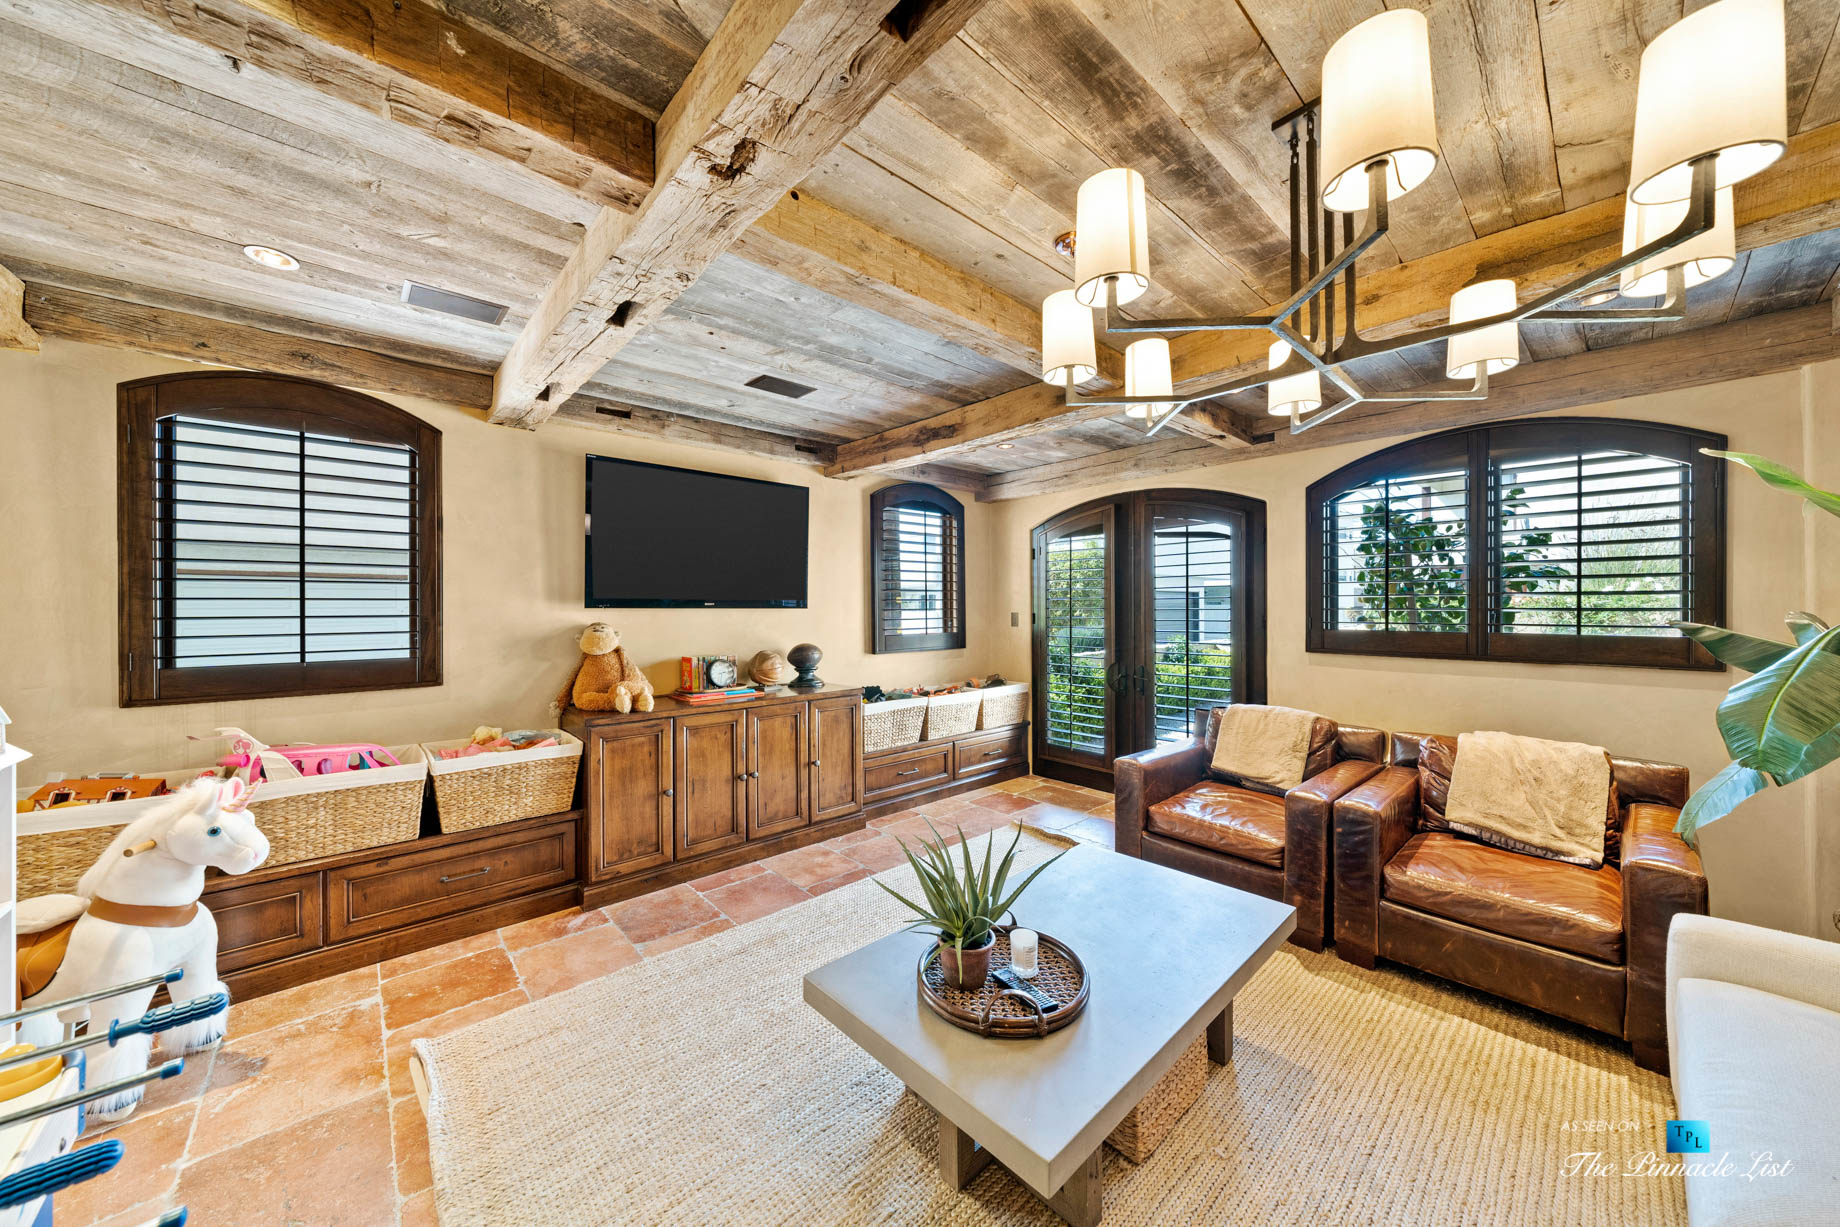 216 7th St, Manhattan Beach, CA, USA - Luxury Real Estate - Coastal Villa Home - Recreation Room